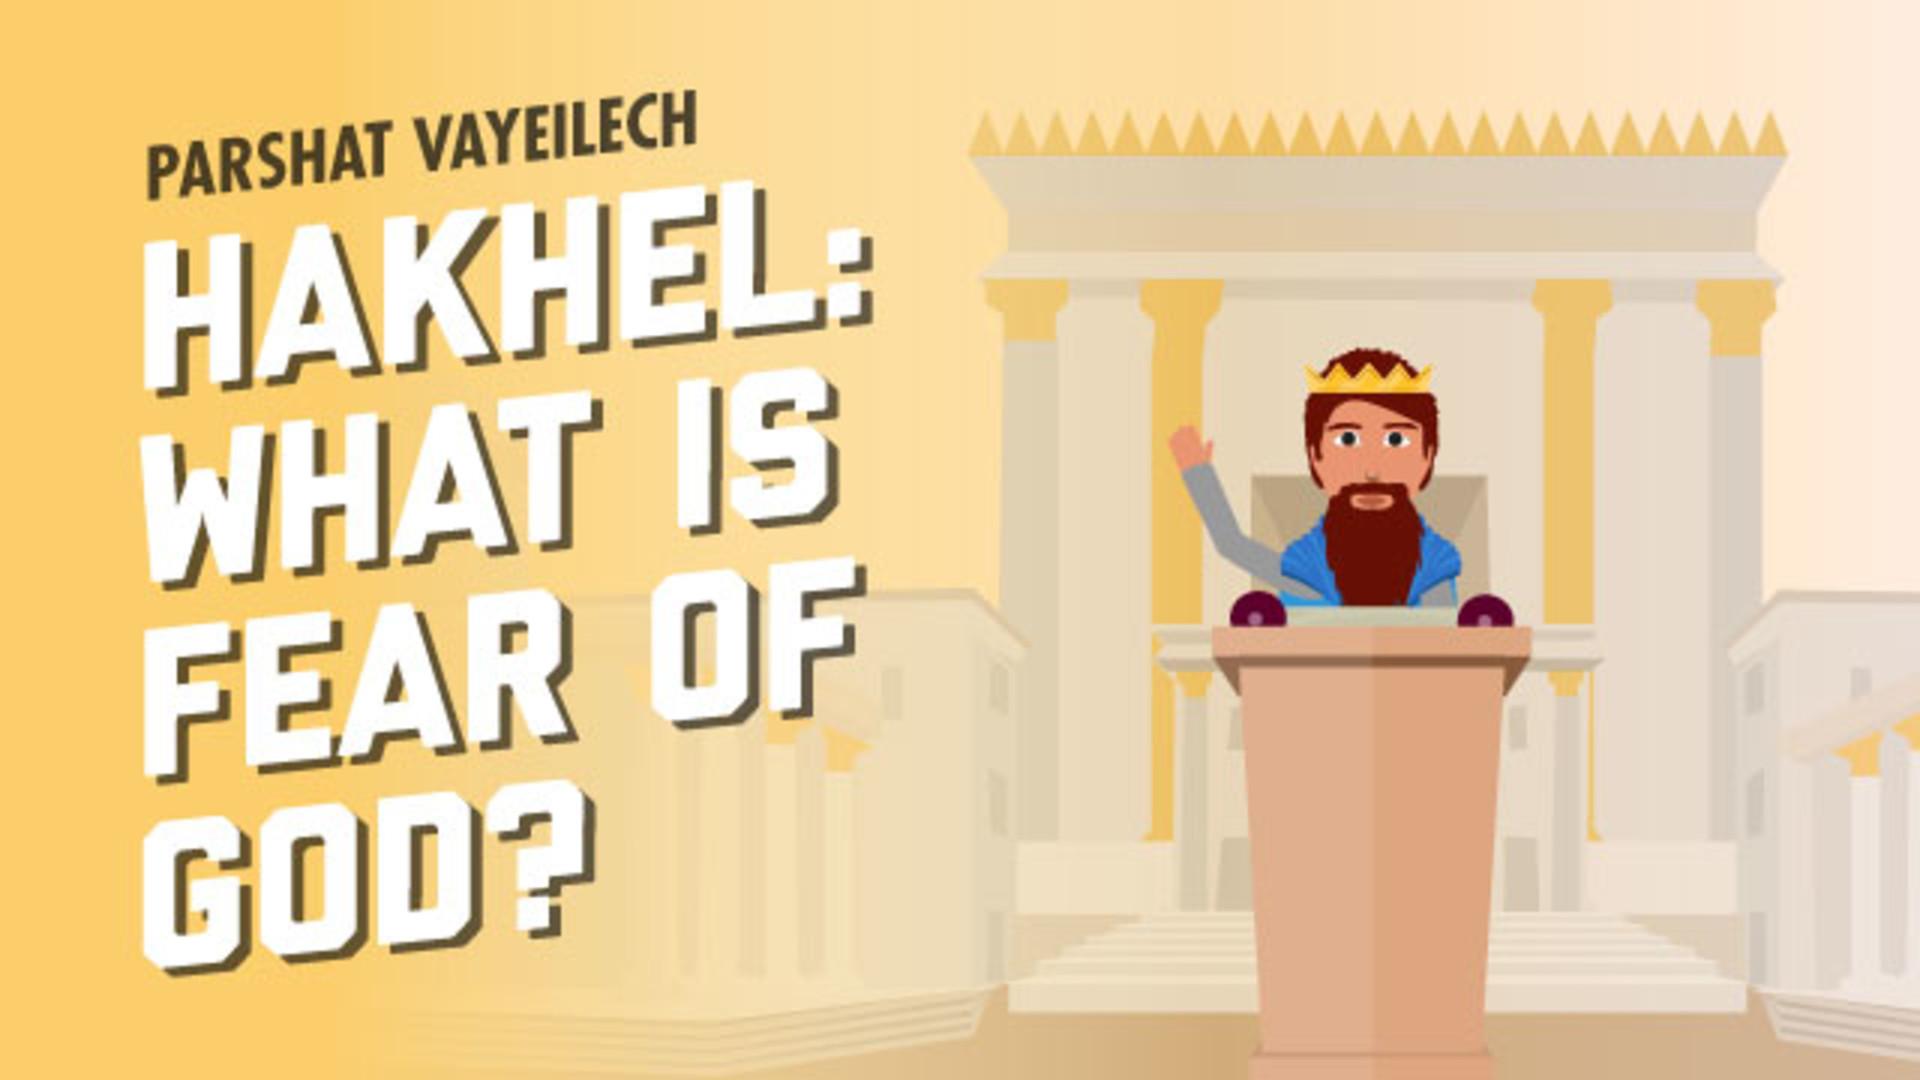 What is fear of God Hakhel